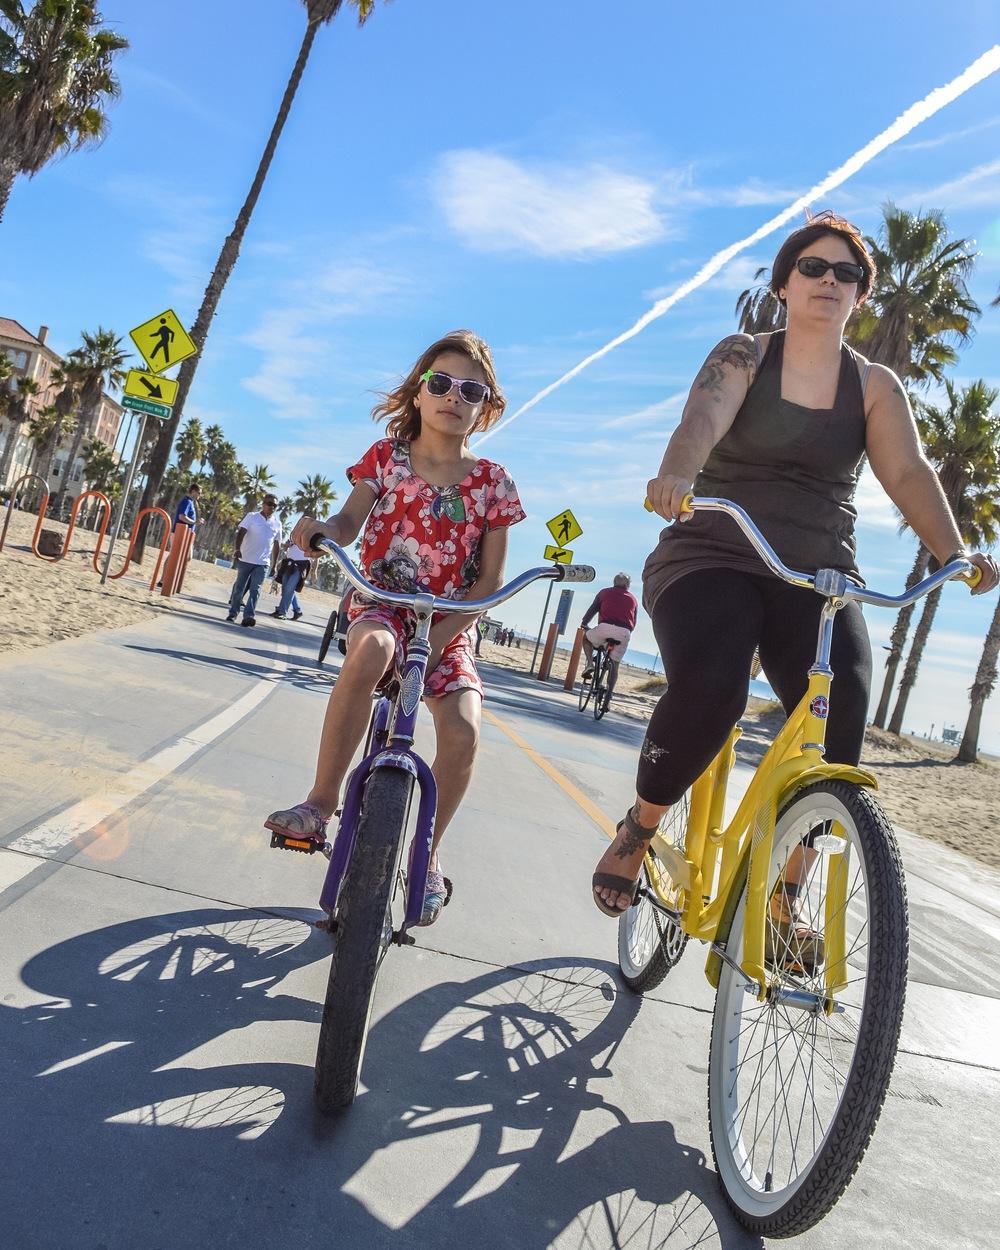 Riding the boardwalk from Venice Beach to Santa Monica, Christmas Day 2013.